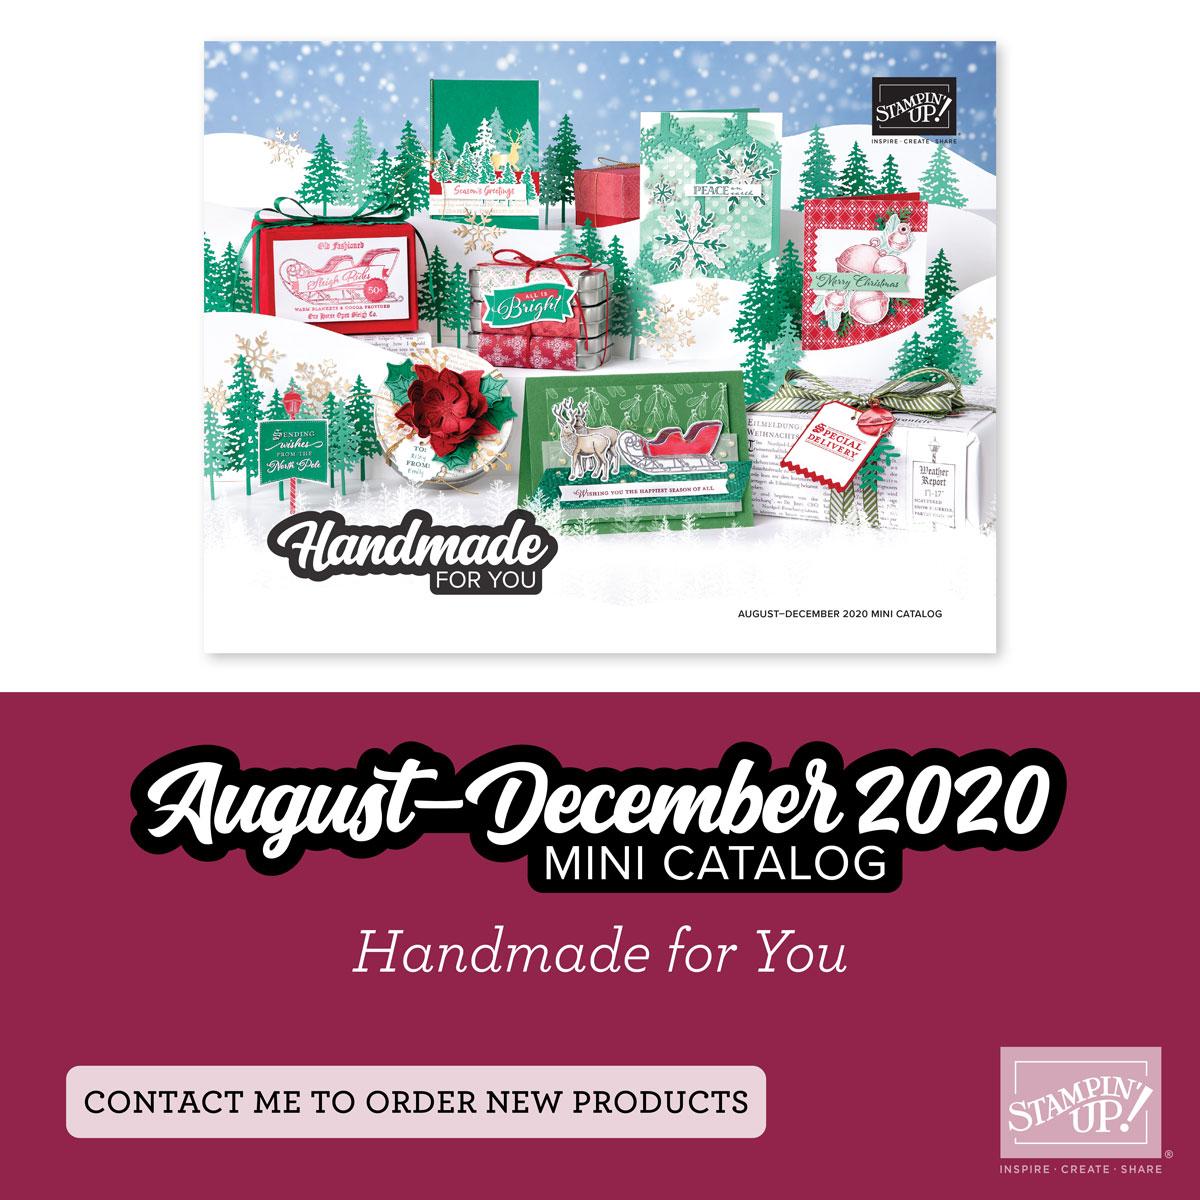 August - December Mini Catalog